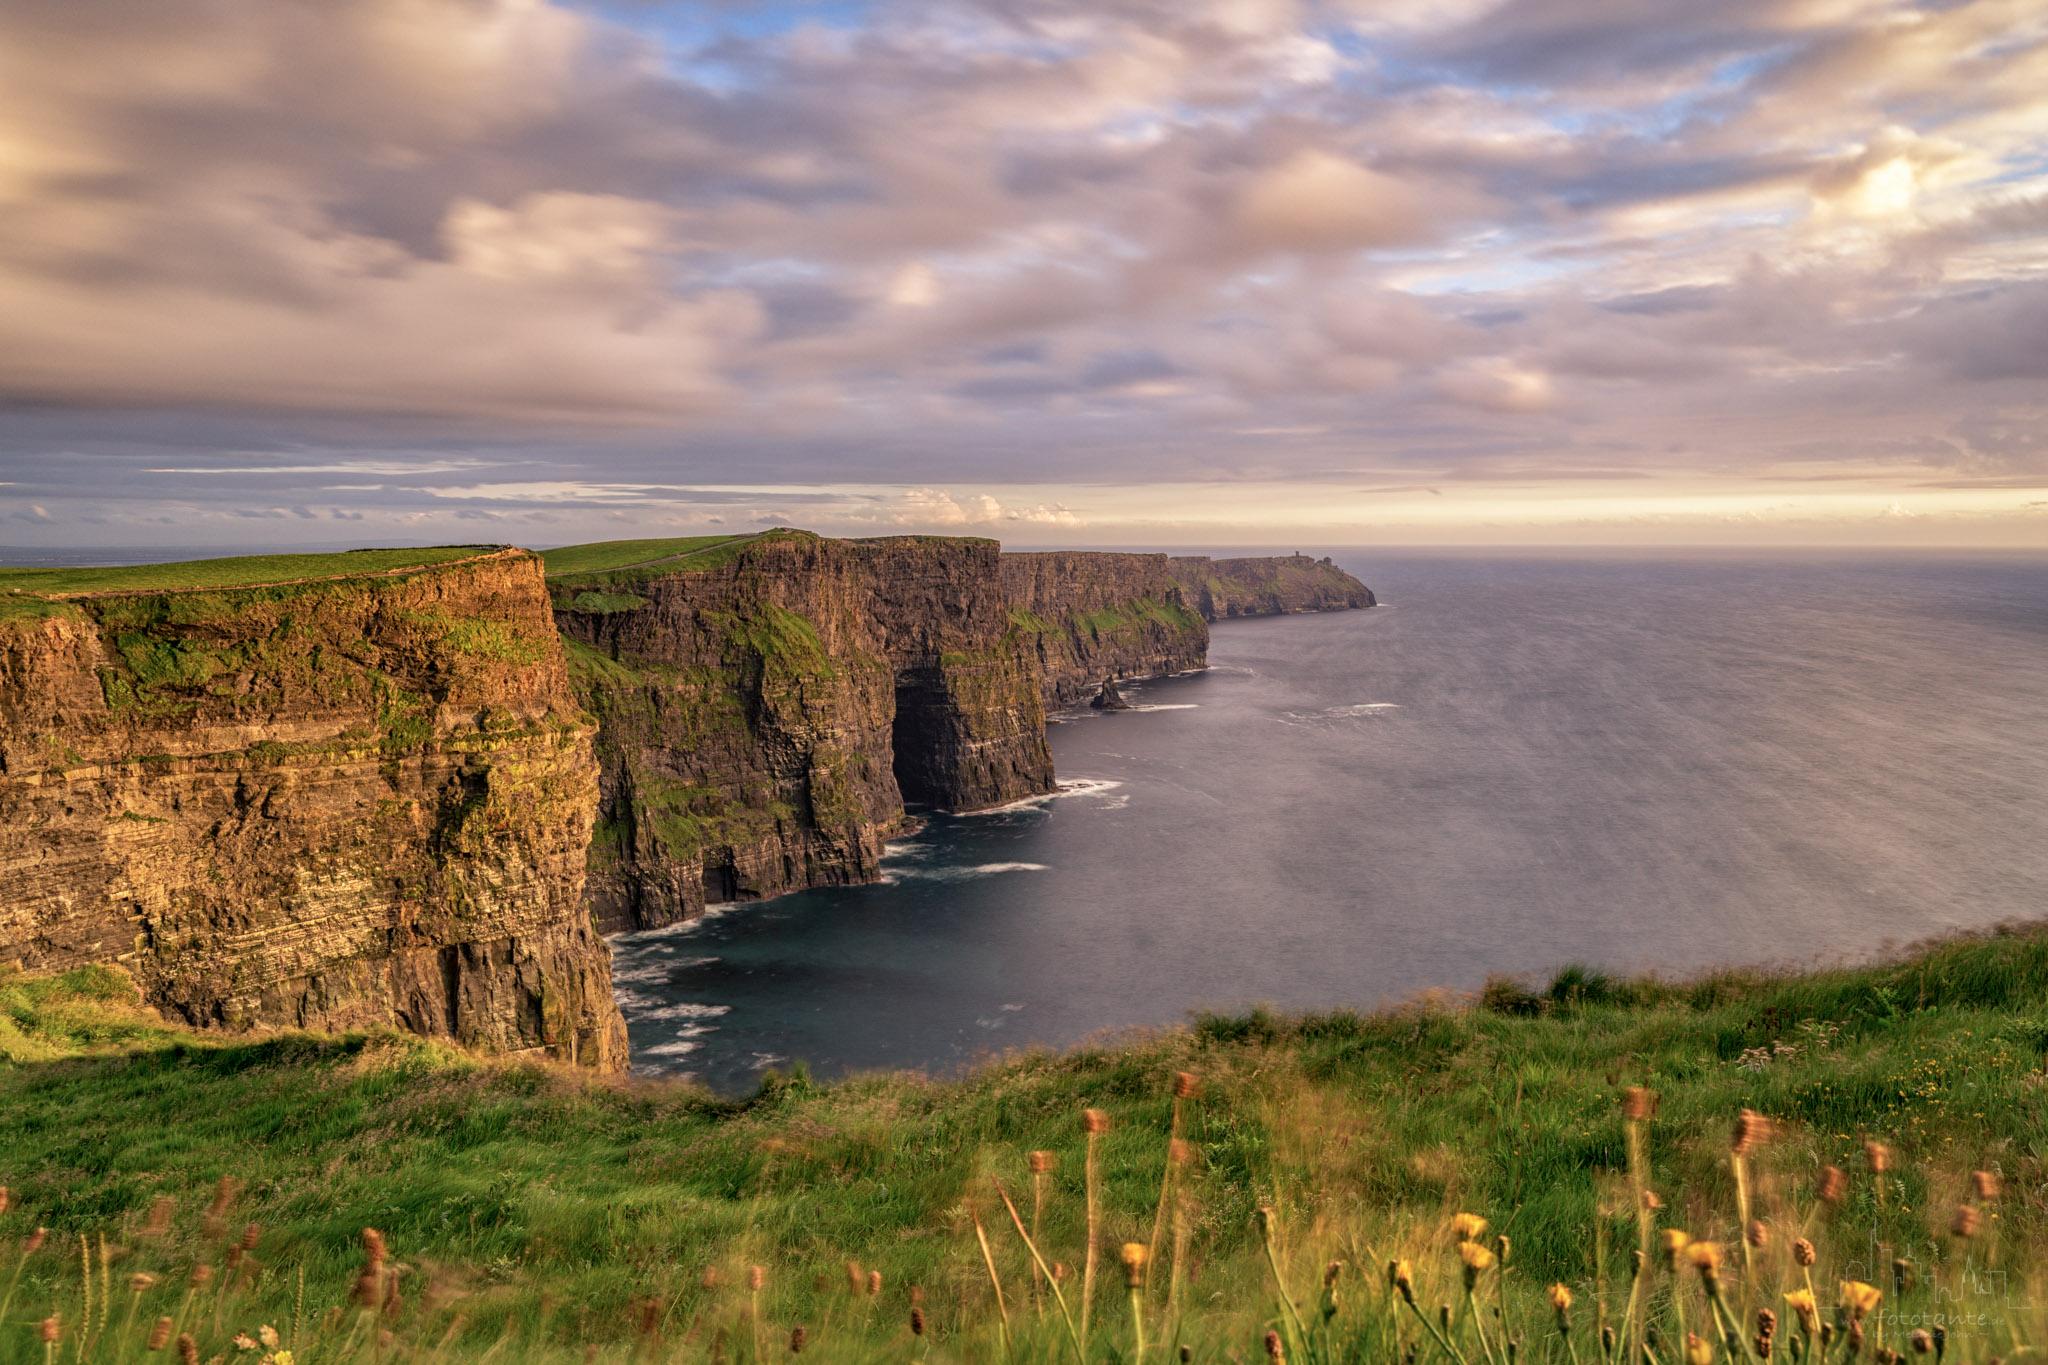 Cliffs of Moher view, Ireland